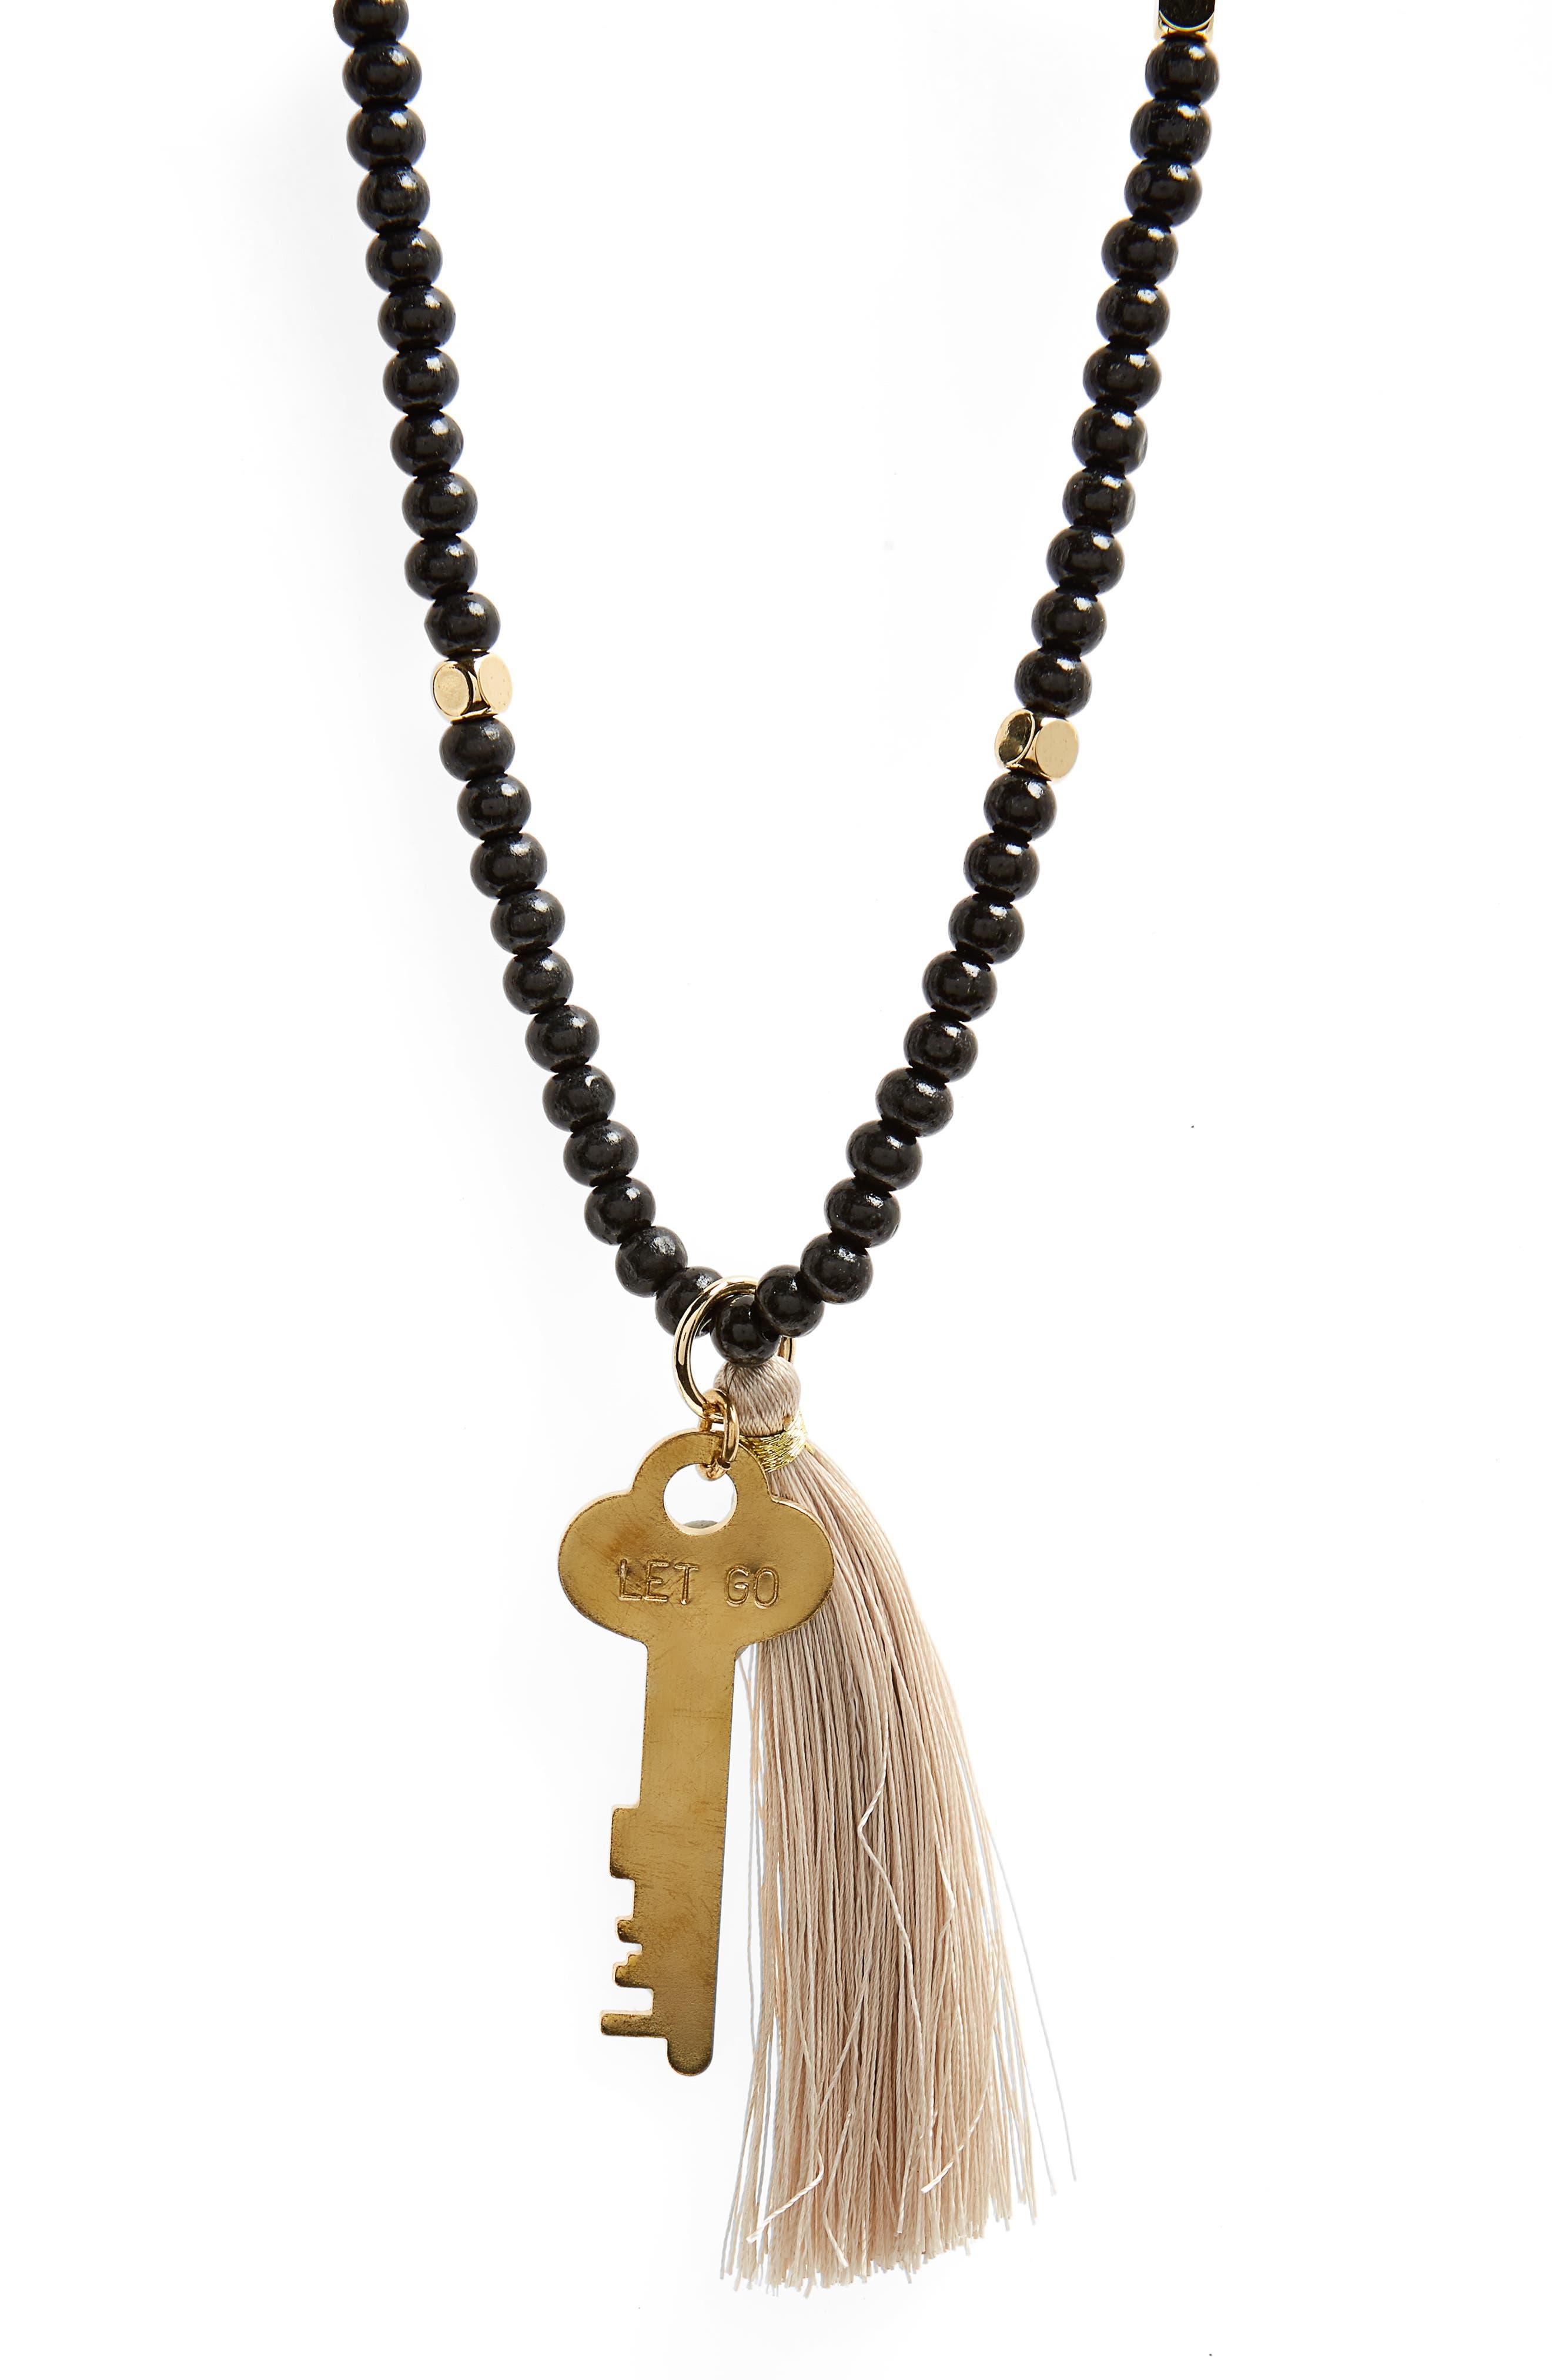 Inspiration Key Charm & Tassel Beaded Necklace,                             Alternate thumbnail 2, color,                             Ebony/ Gold- Let Go